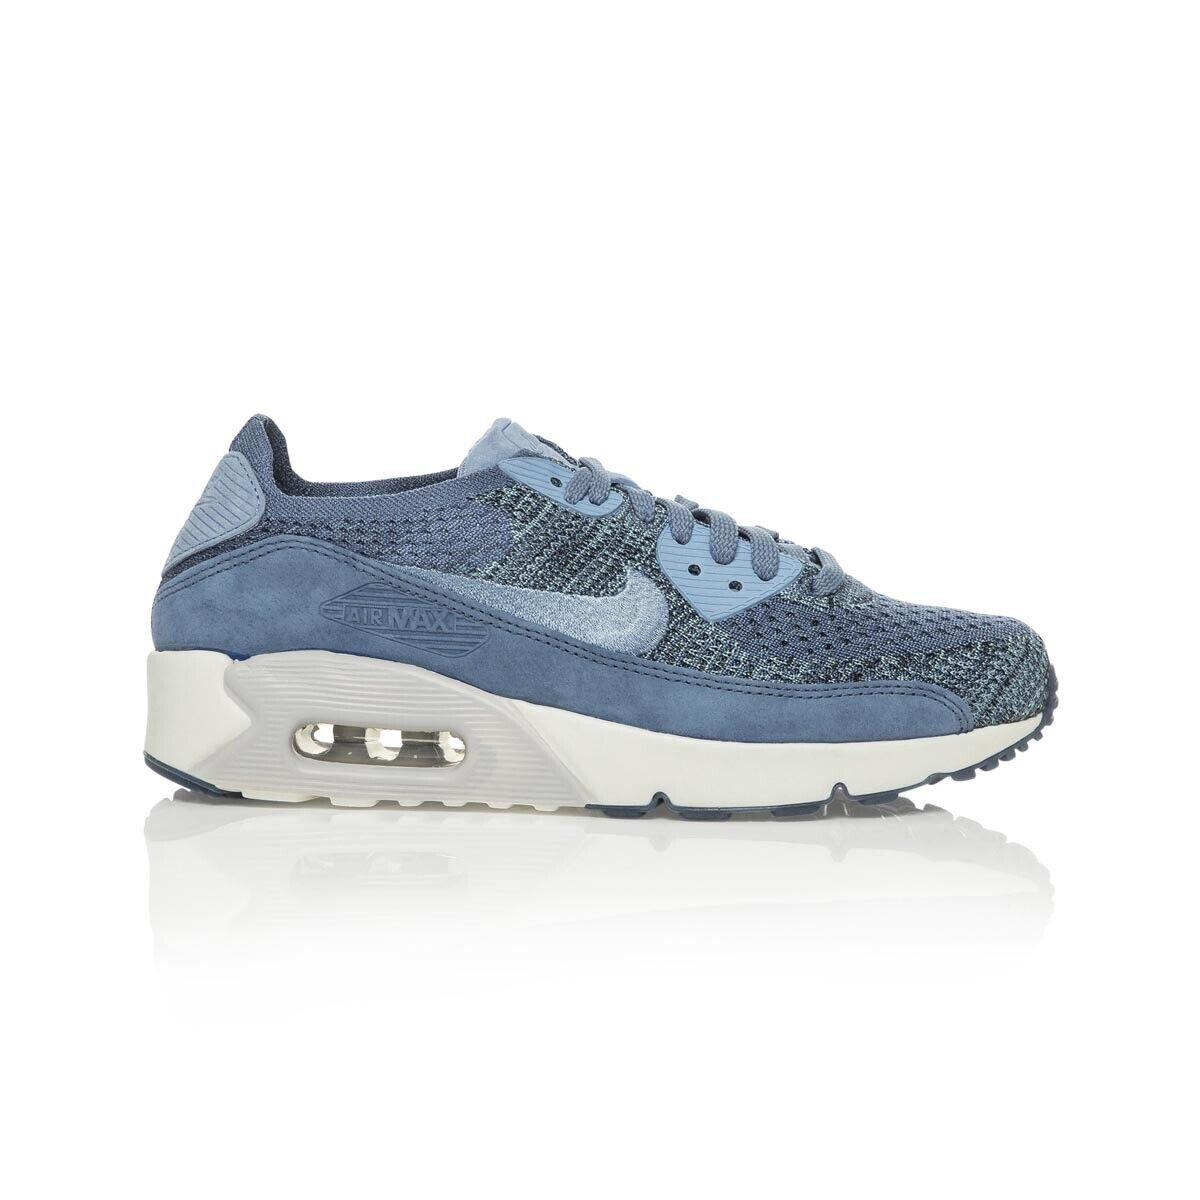 Nike NikeLab Air Max 90 Flyknit Men's shoe Ocean FogWork BluePure PlatinumS